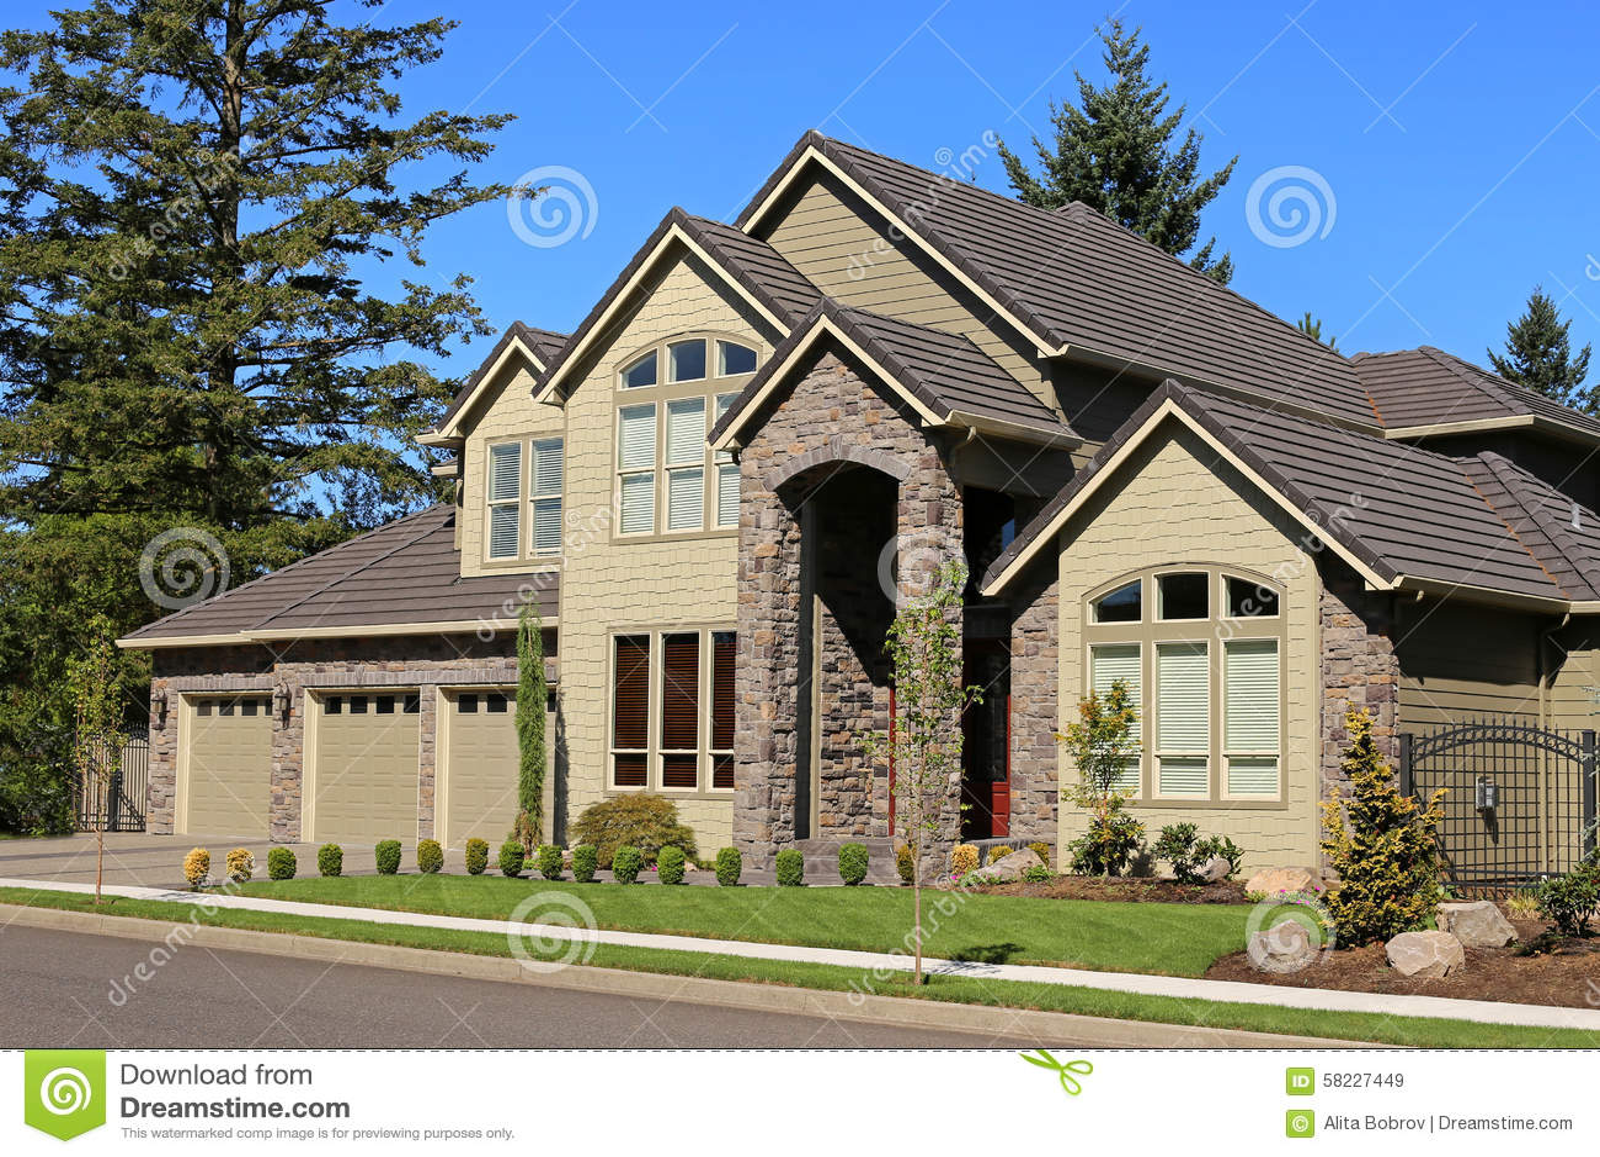 belle maison familiale image stock image du trappe entr e 58227449. Black Bedroom Furniture Sets. Home Design Ideas